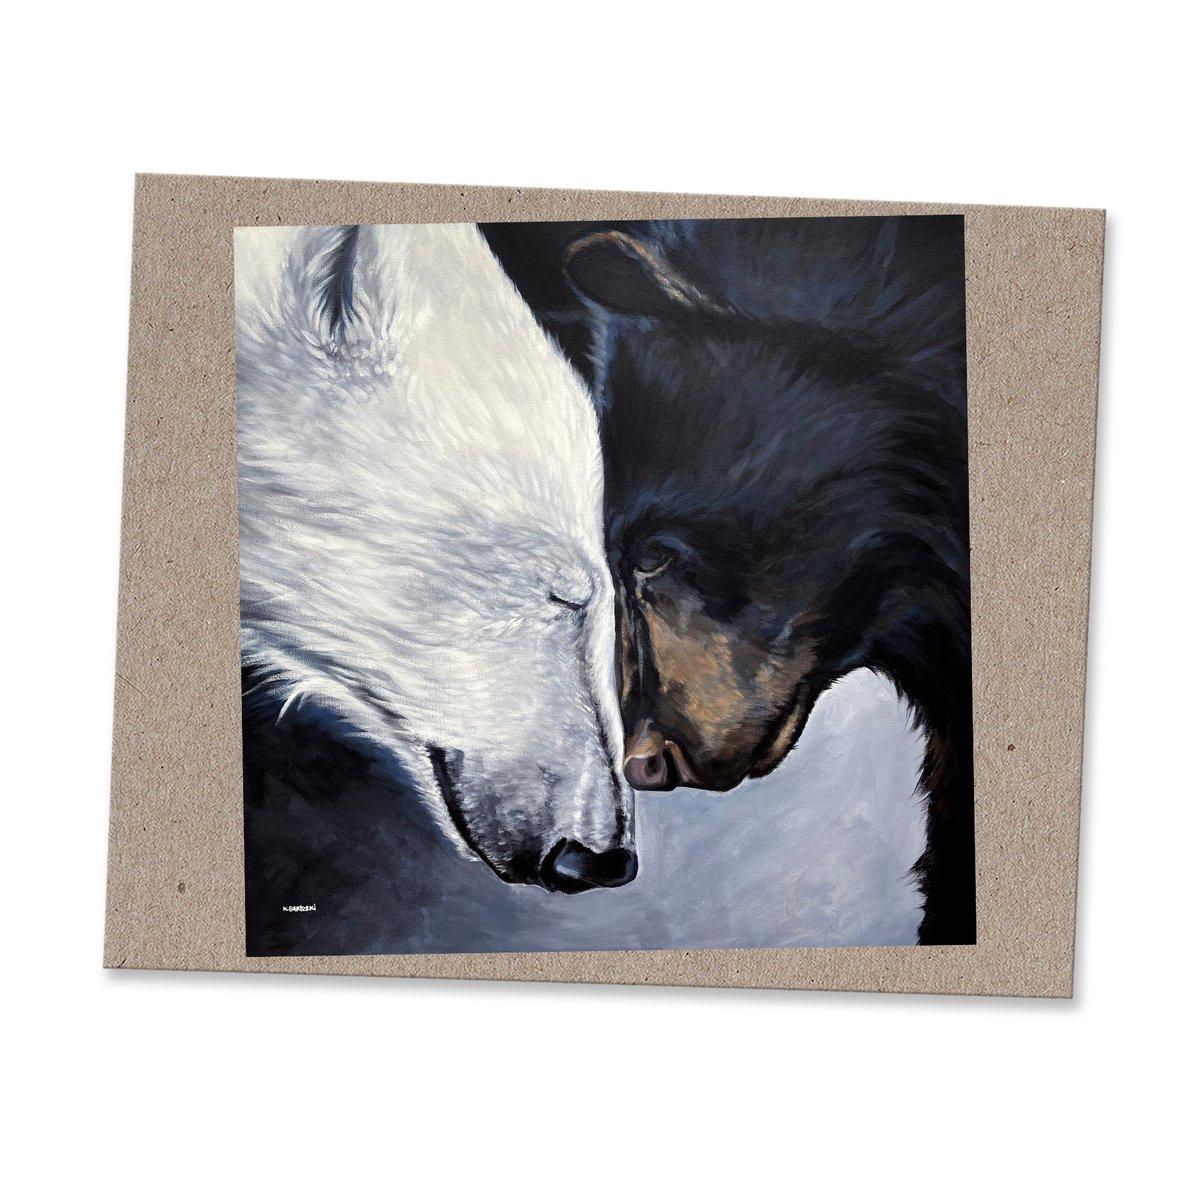 Image of 2 BEARS print